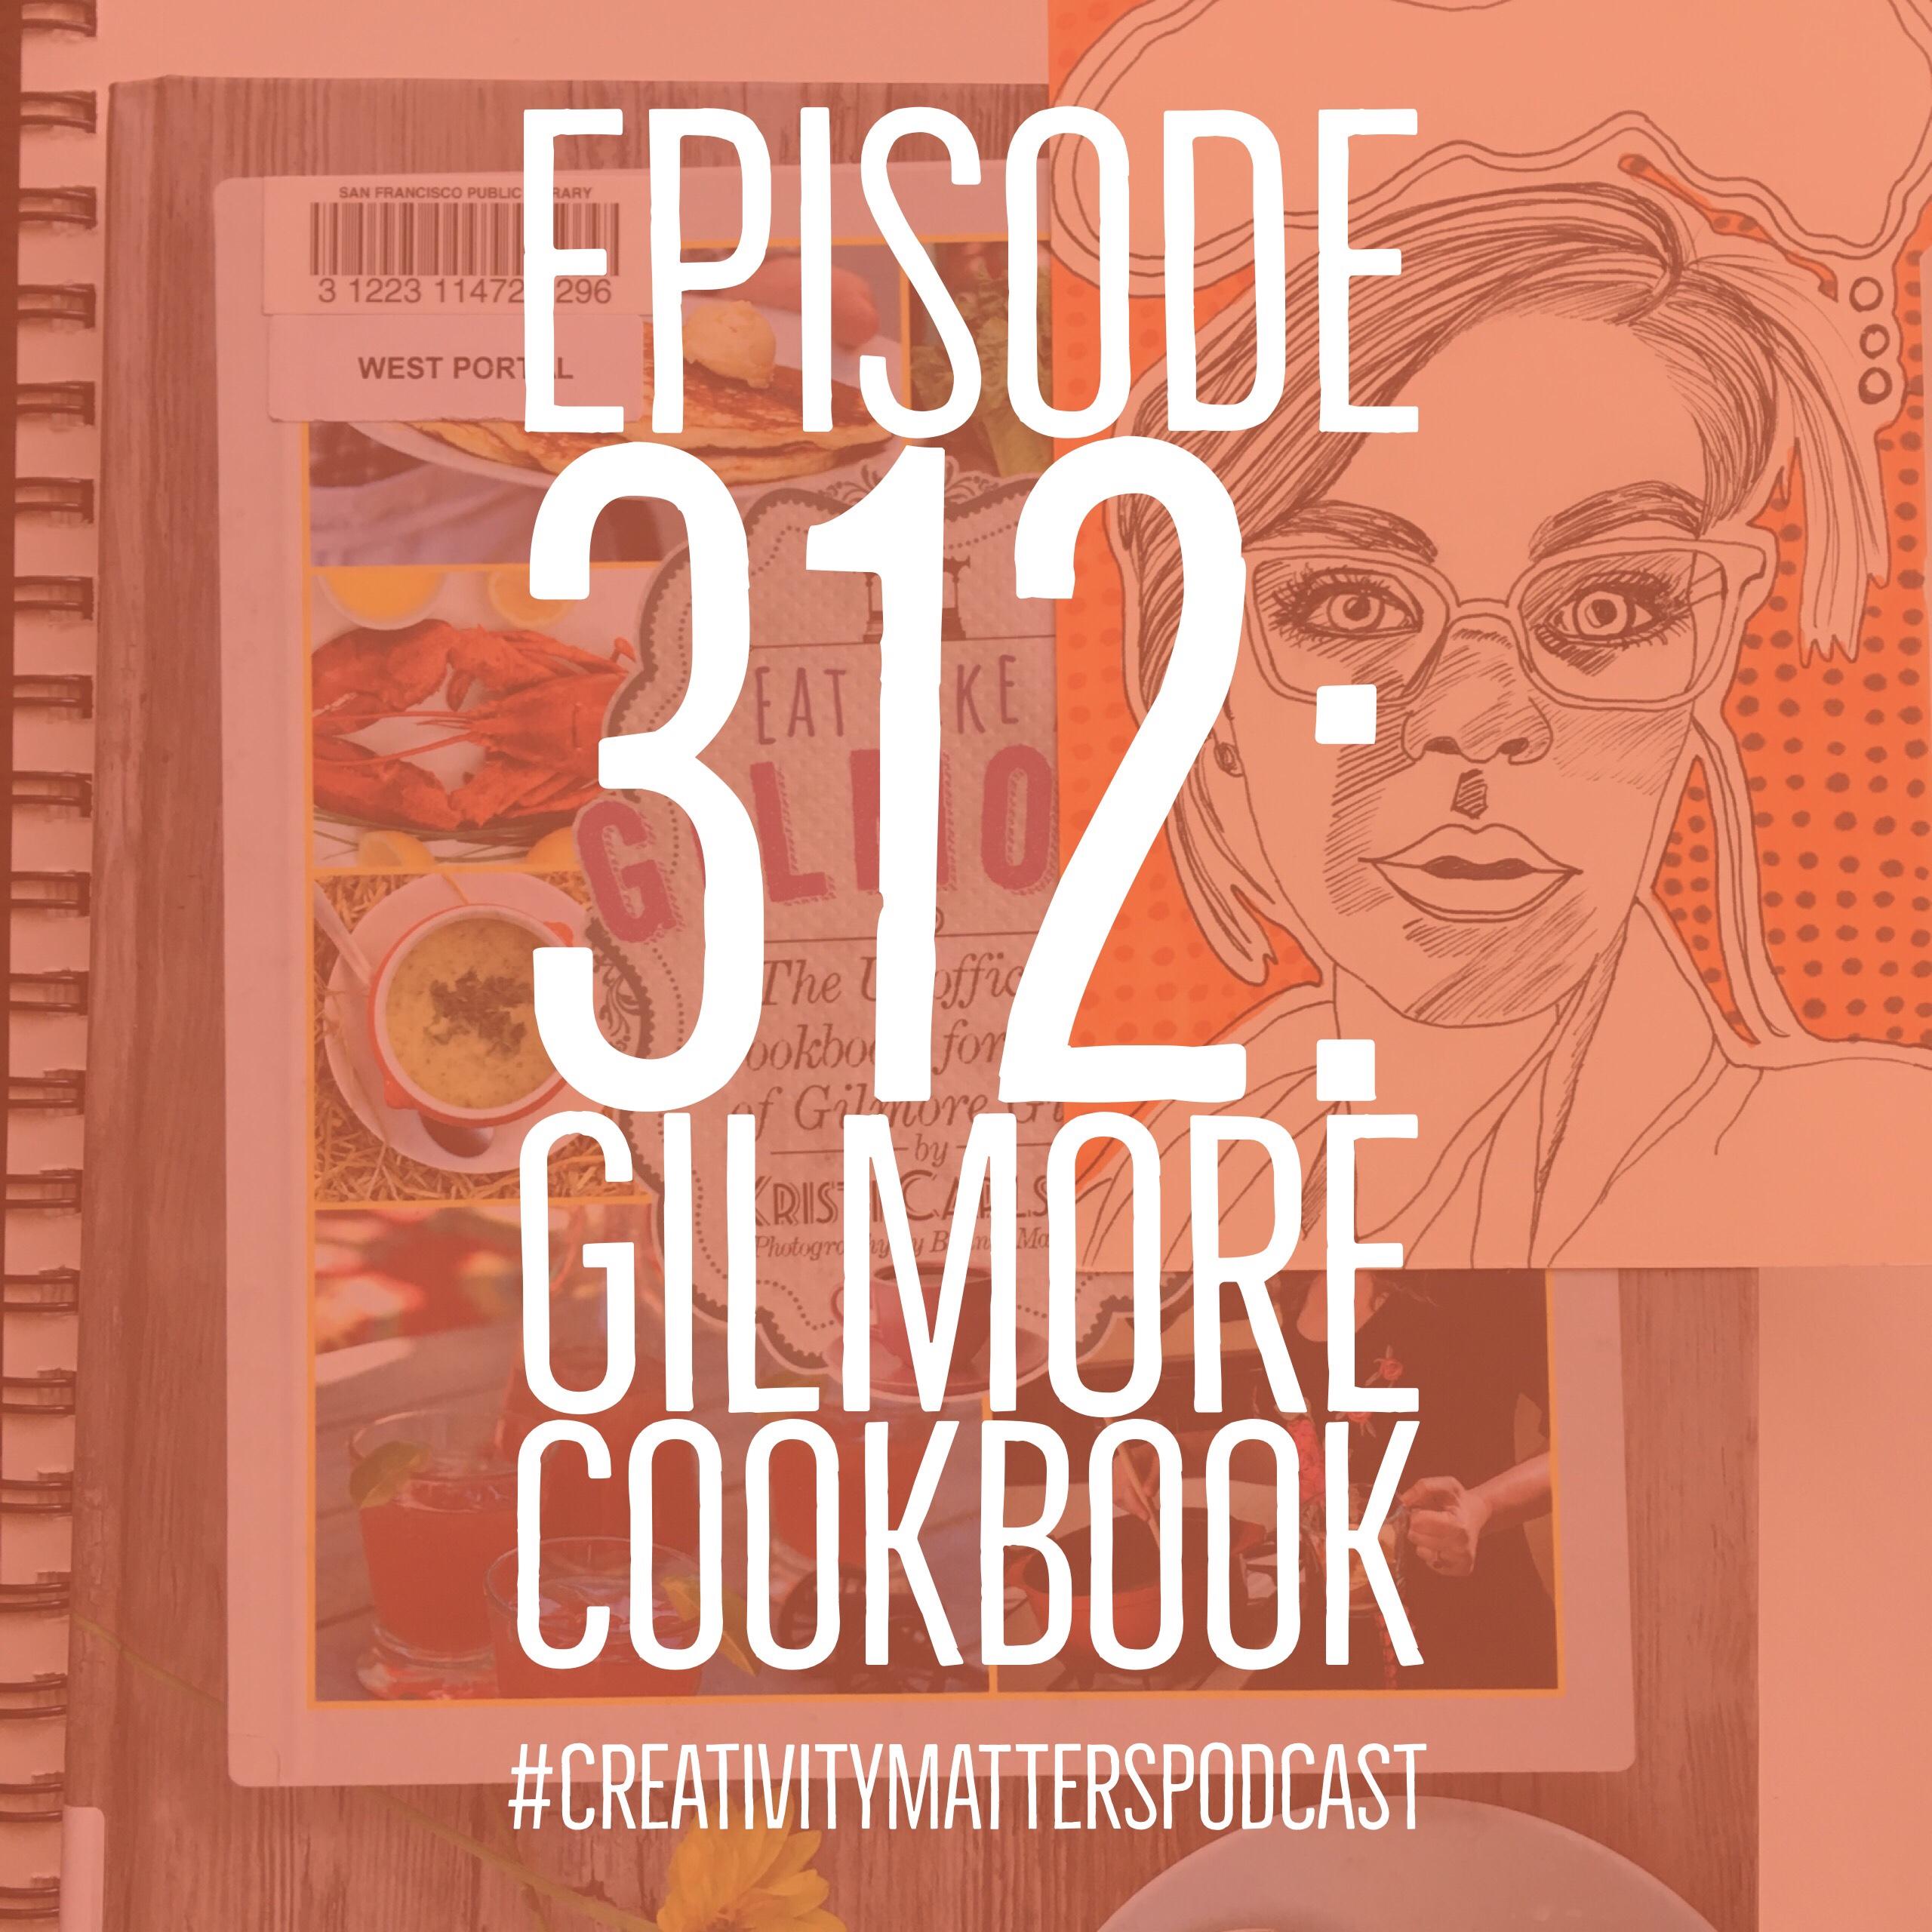 Episode 312: Gilmore Cookbook